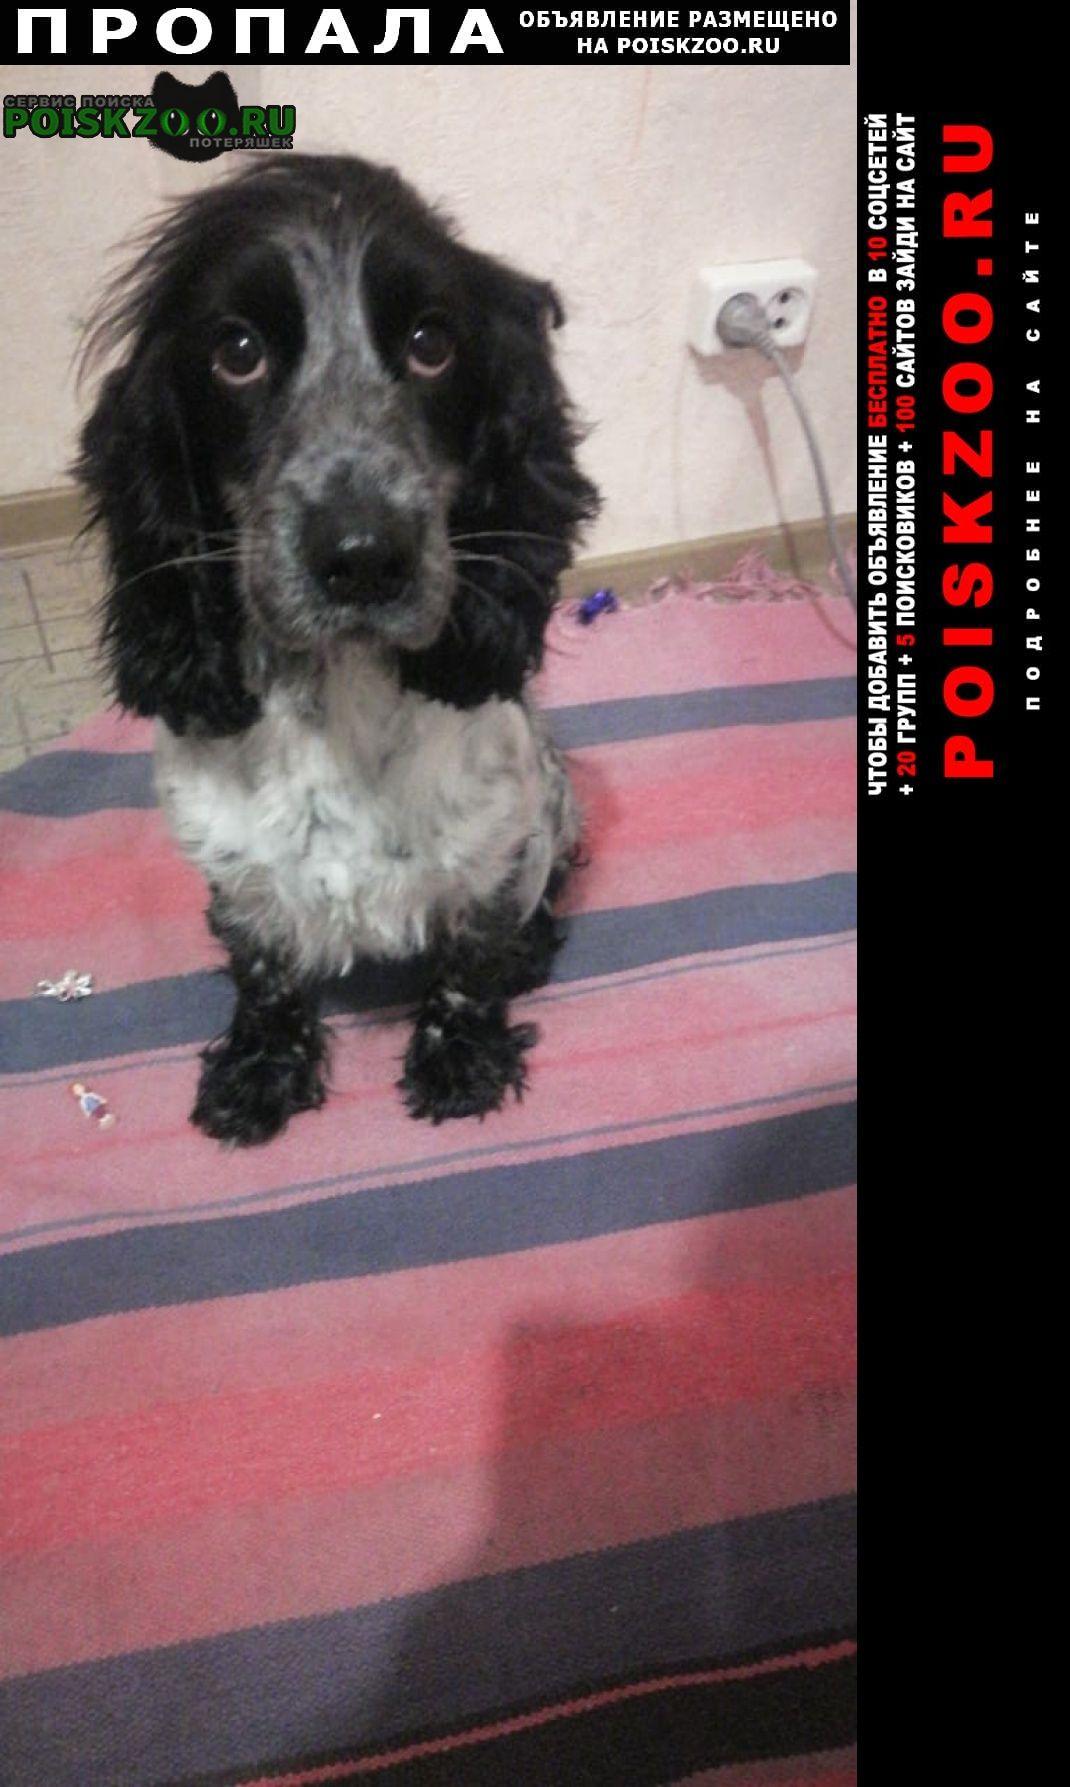 Пропала собака кличка берта Самара